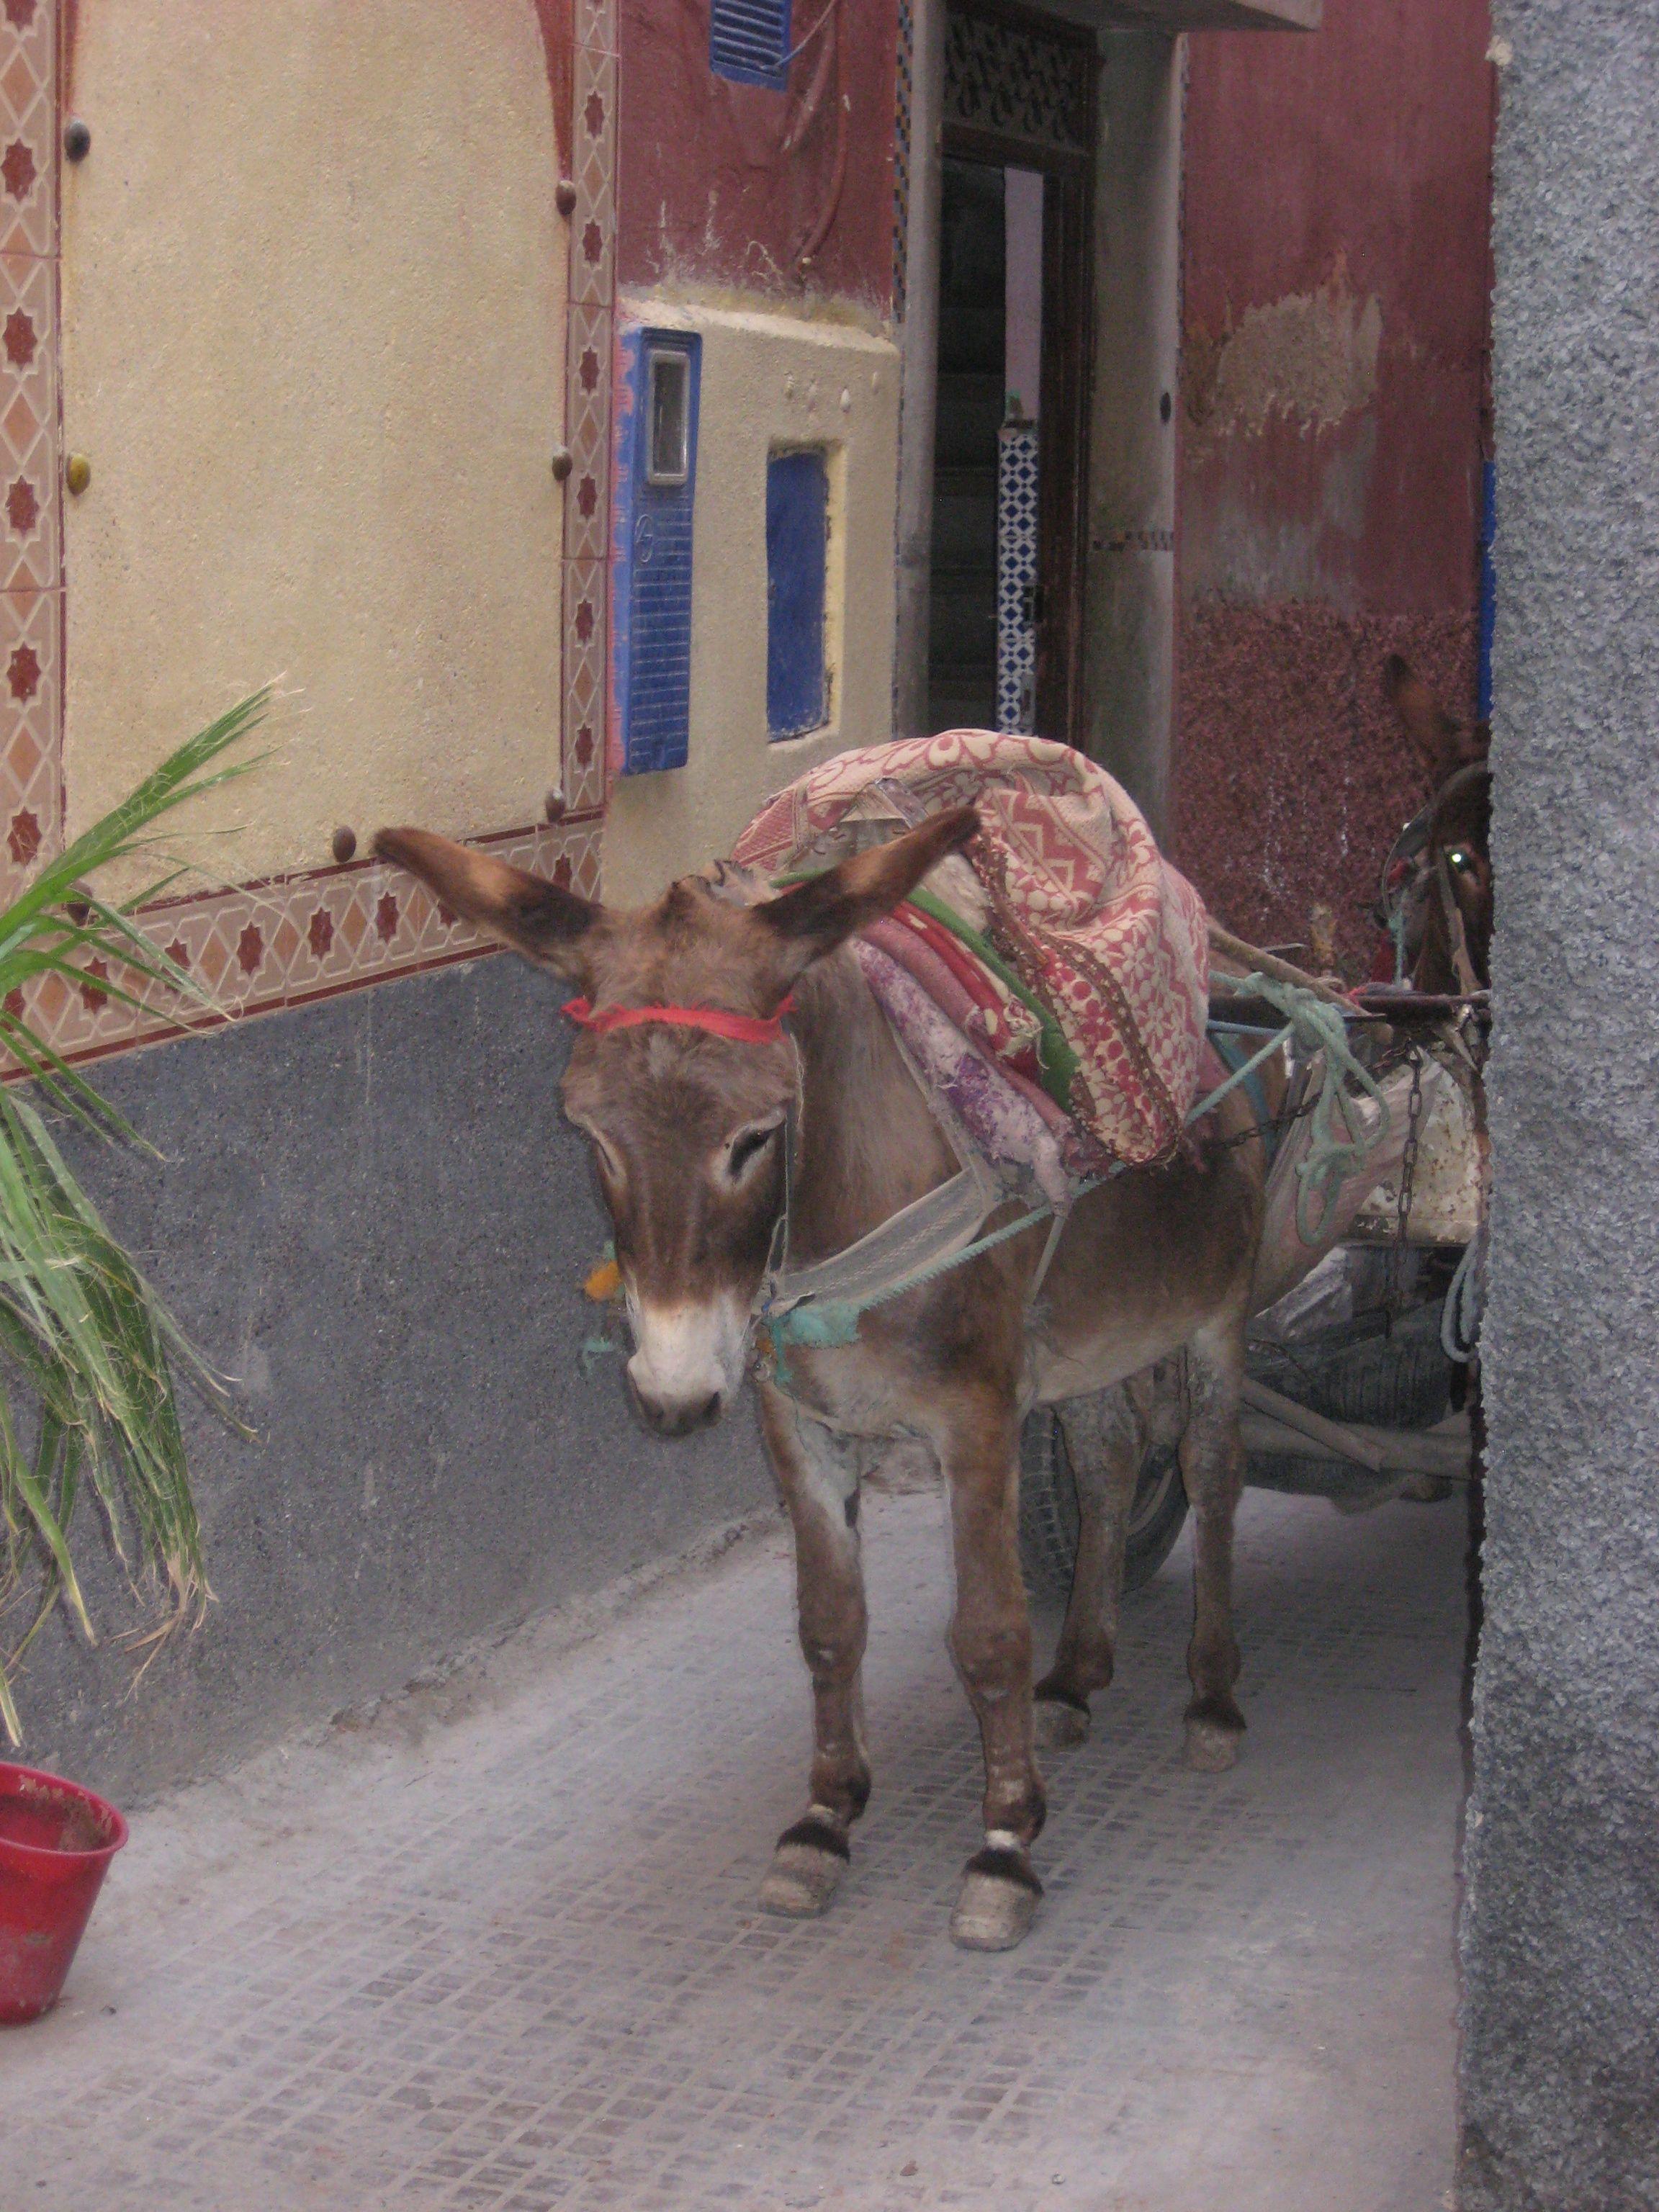 Cute, depressed donkey!